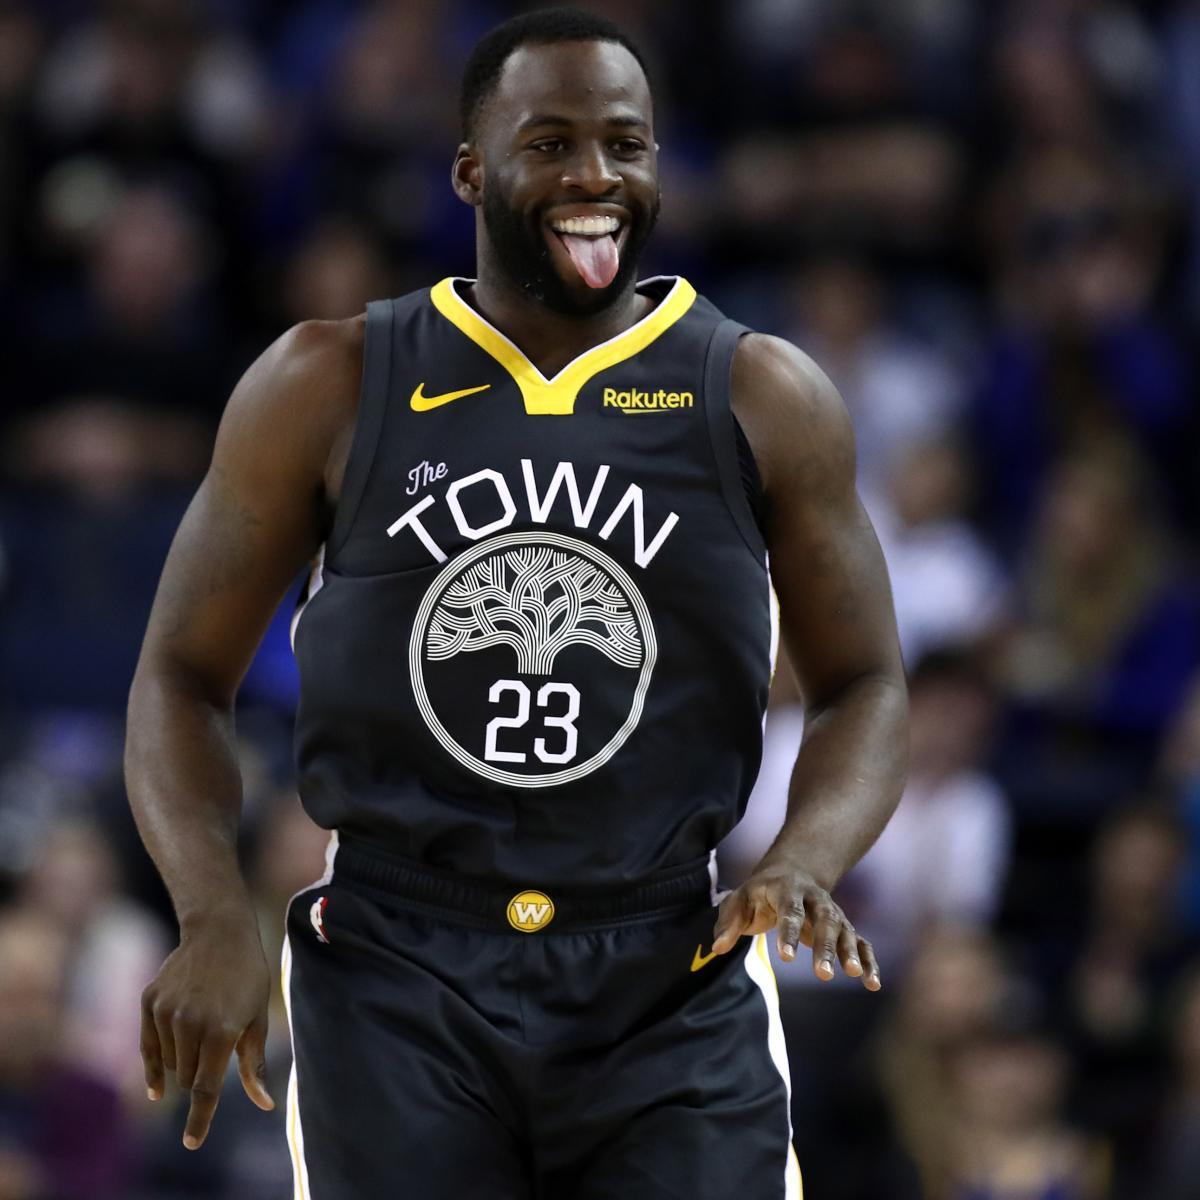 2019 NBA Championship Odds: Warriors Remain Heavy